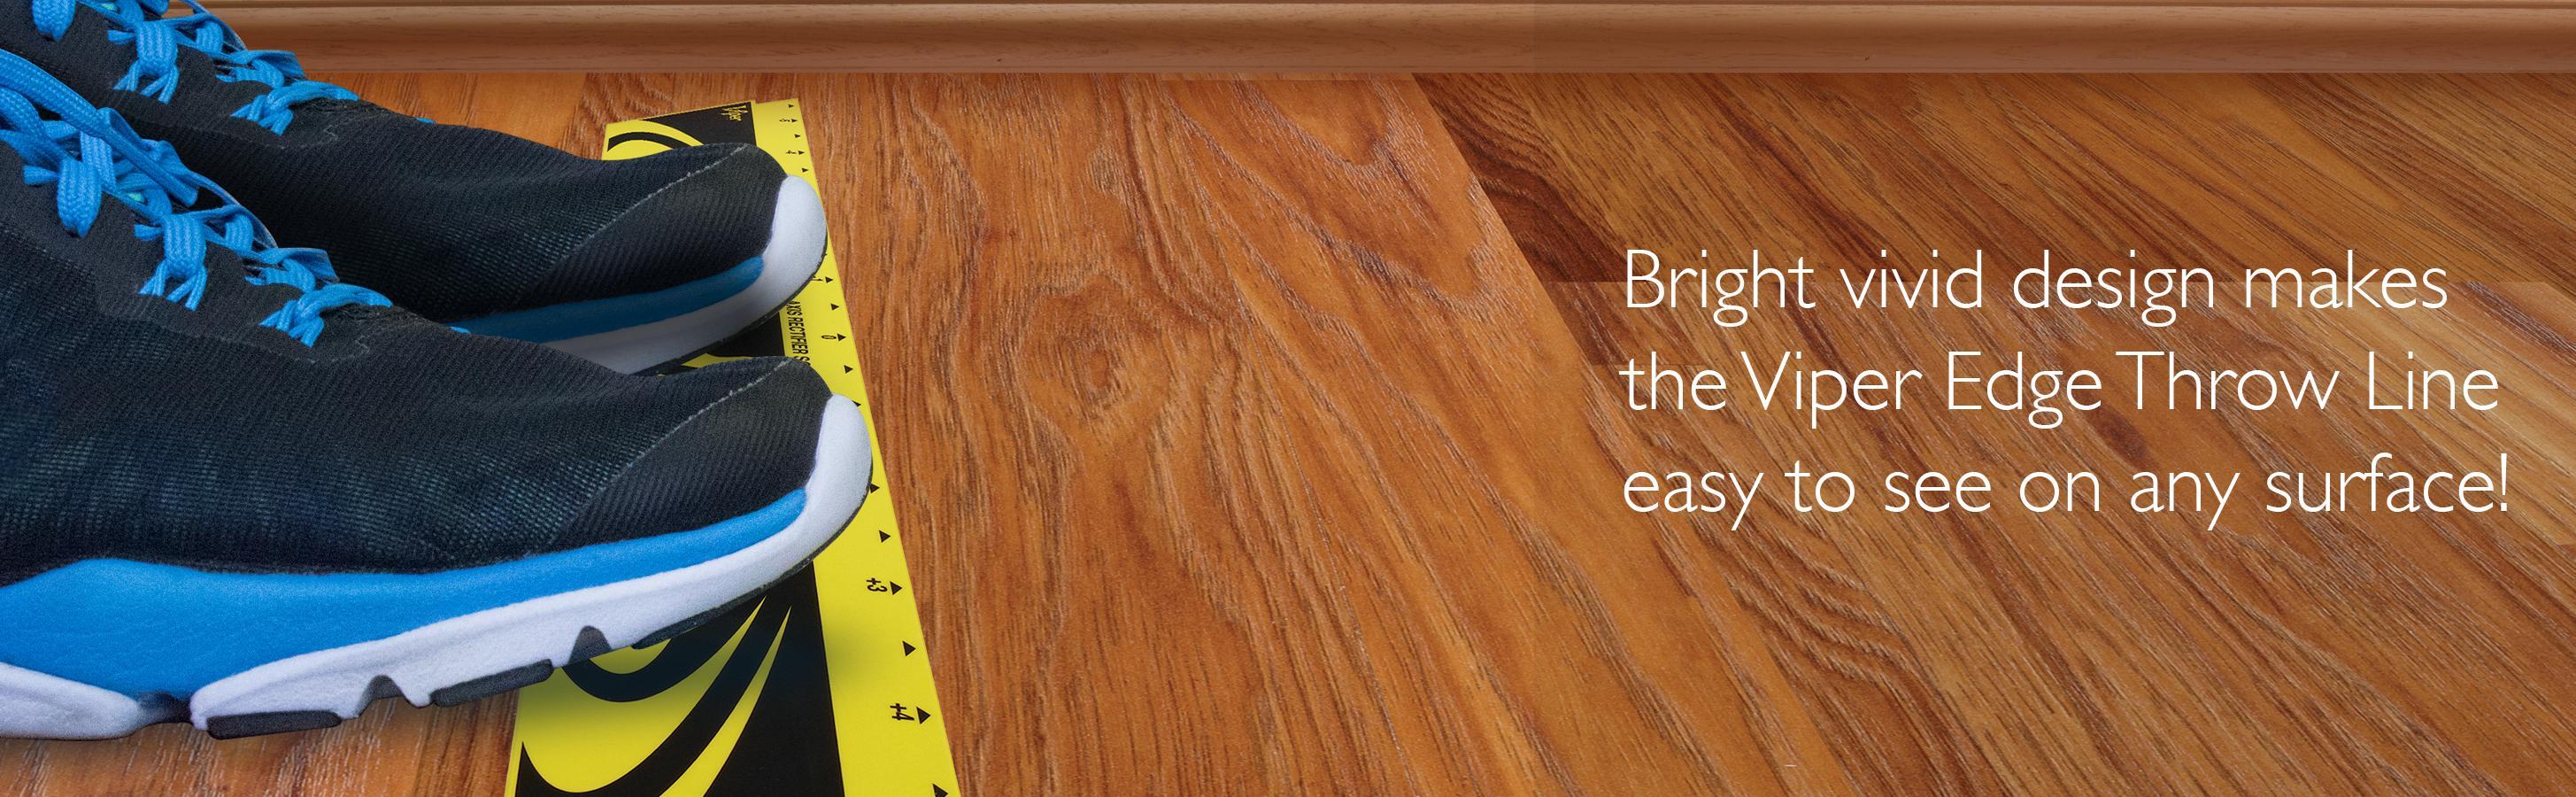 Amazon Com Viper Dart Throw Toe Line Floor Marker Edge